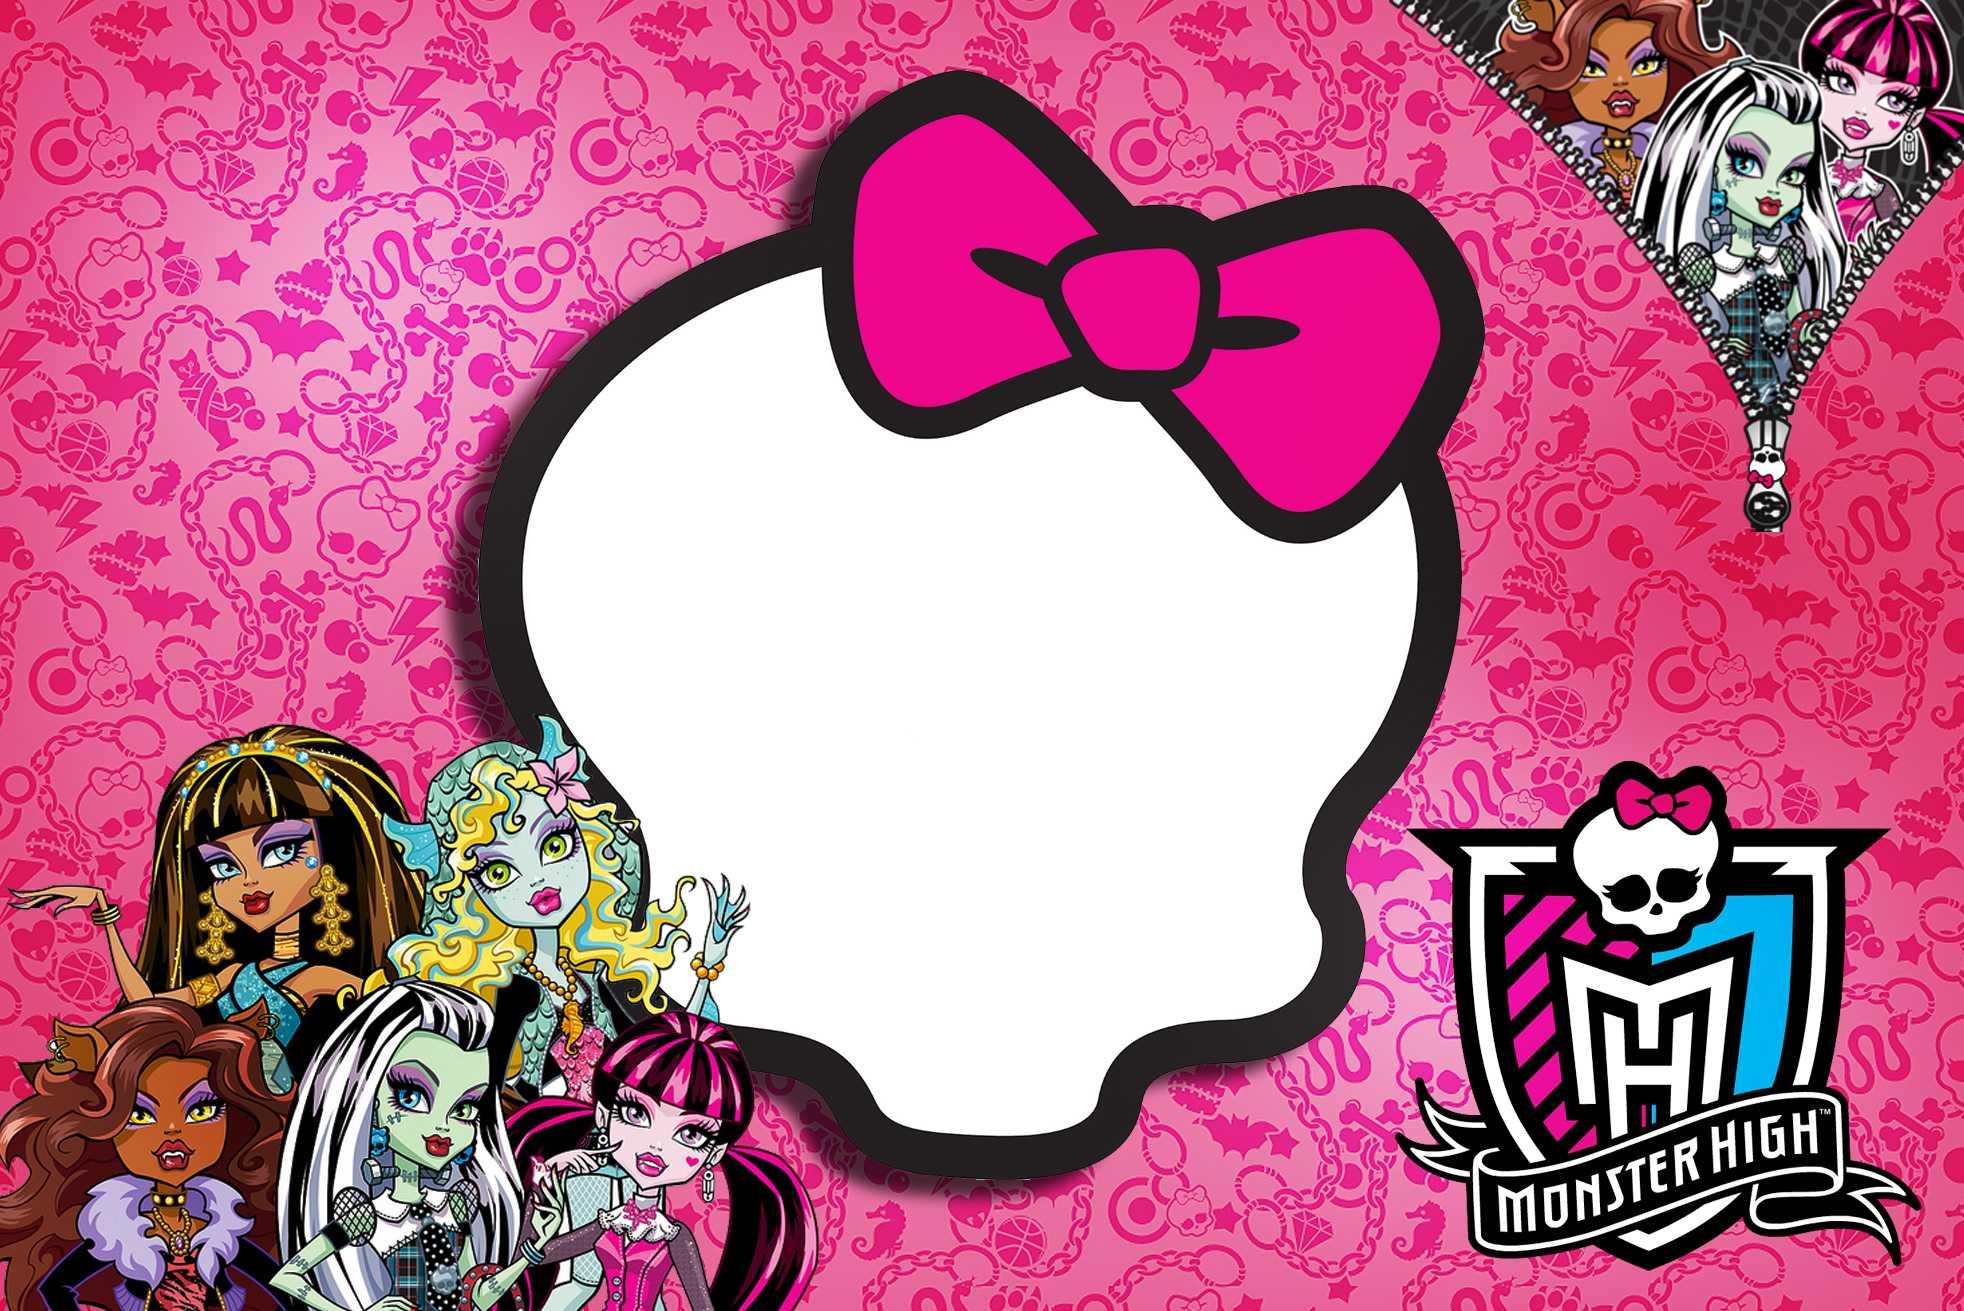 Free Printable Monster High Birthday Invitations Layout Regarding Monster High Birthday Card Template